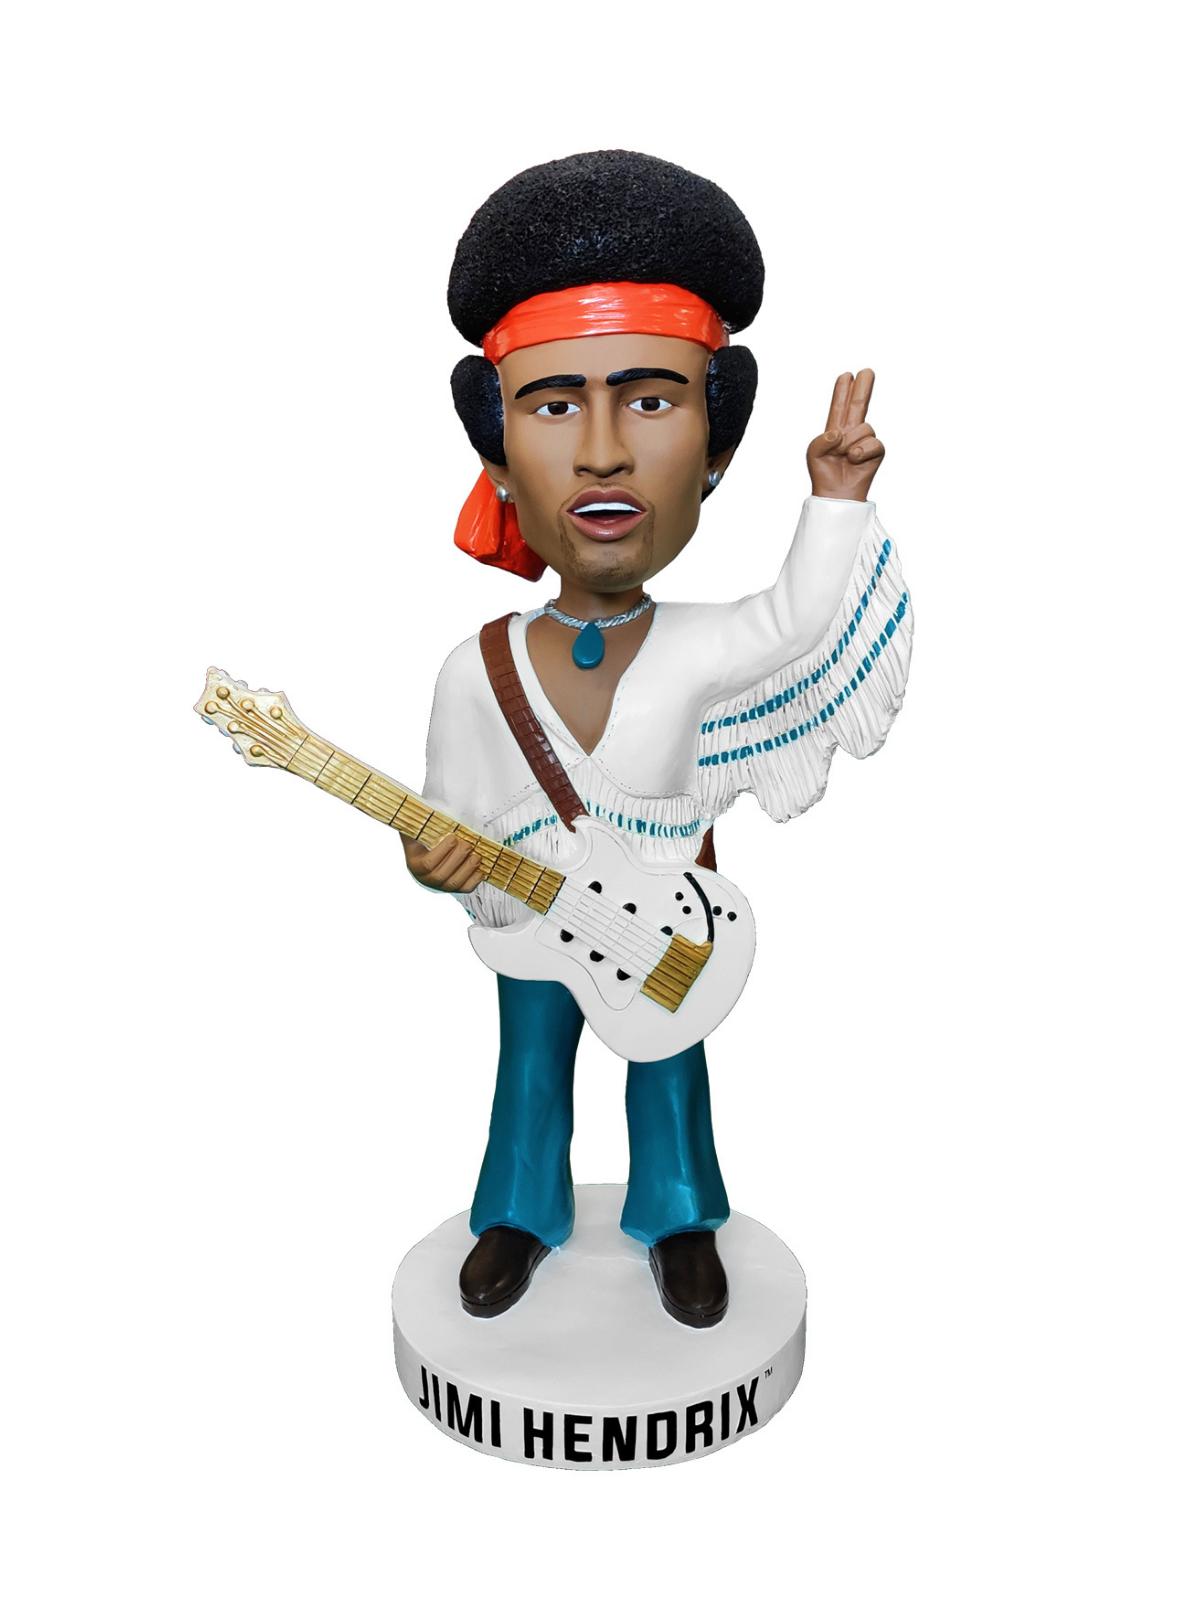 "Limited Edition 36"" Jimi Hendrix Bobblehead"